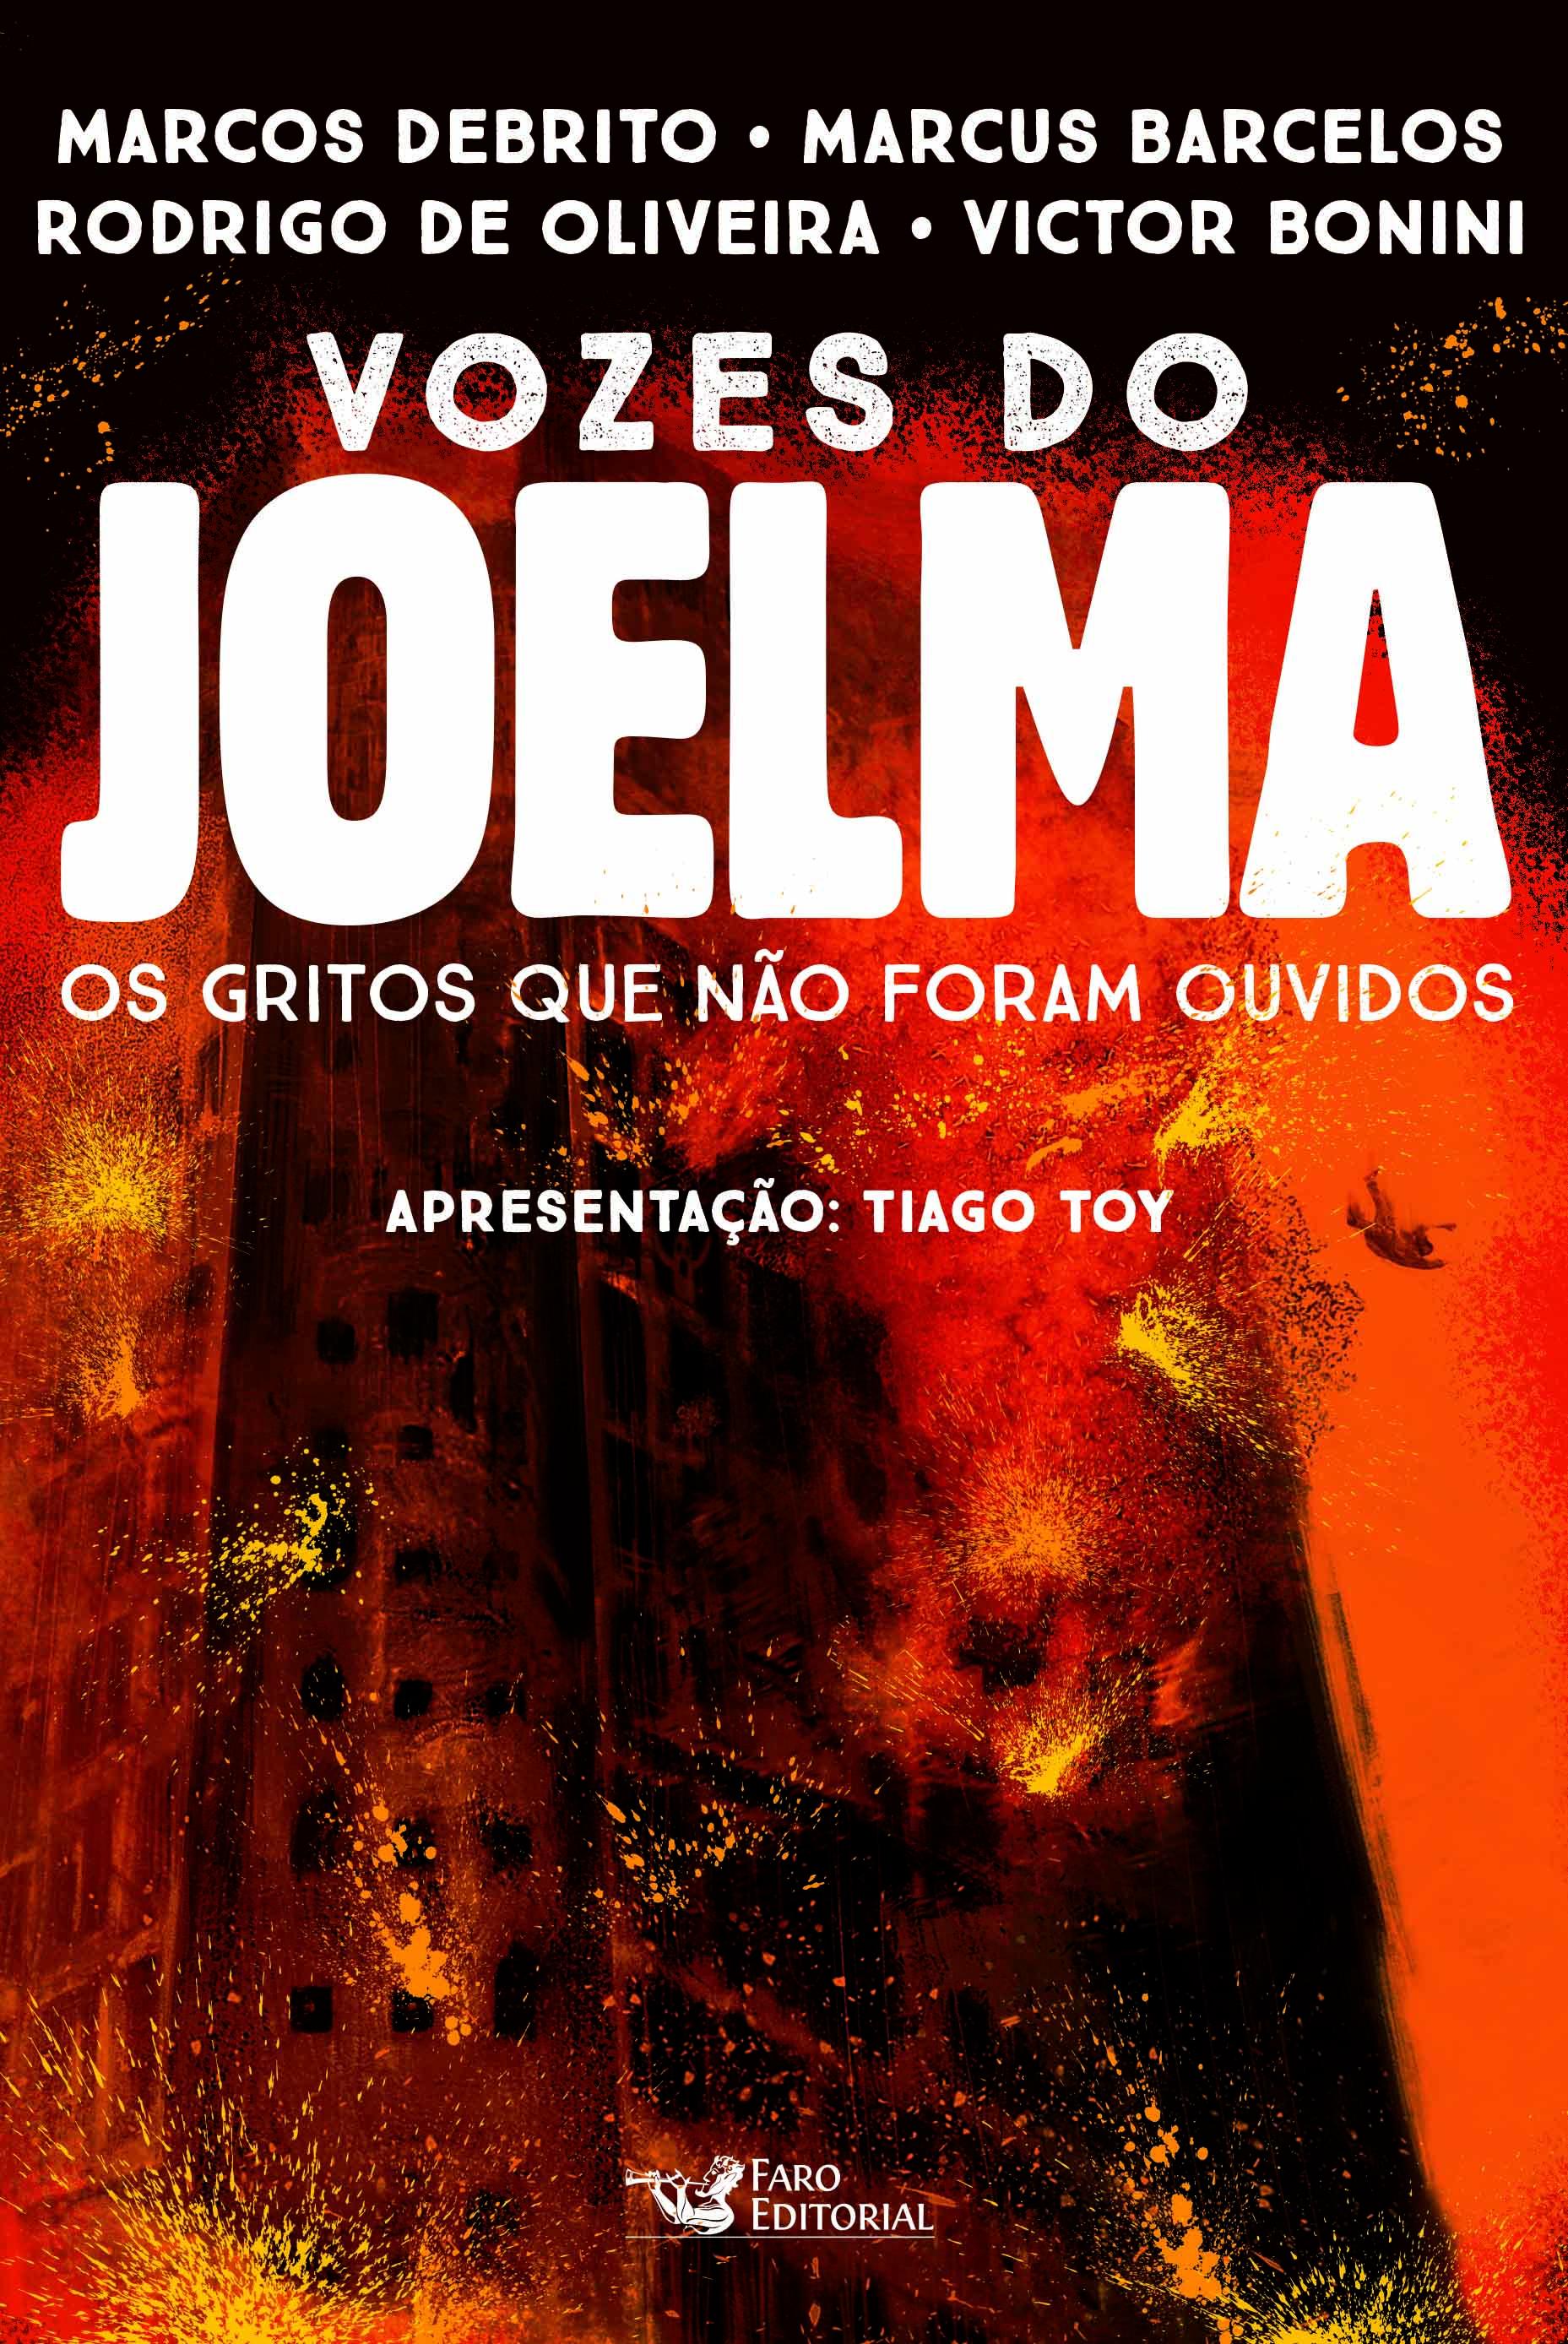 Vozes do Joelma - Marcos DeBrito, Rodrigo de Oliveira, Marcus Barcelos e Victor Bonini